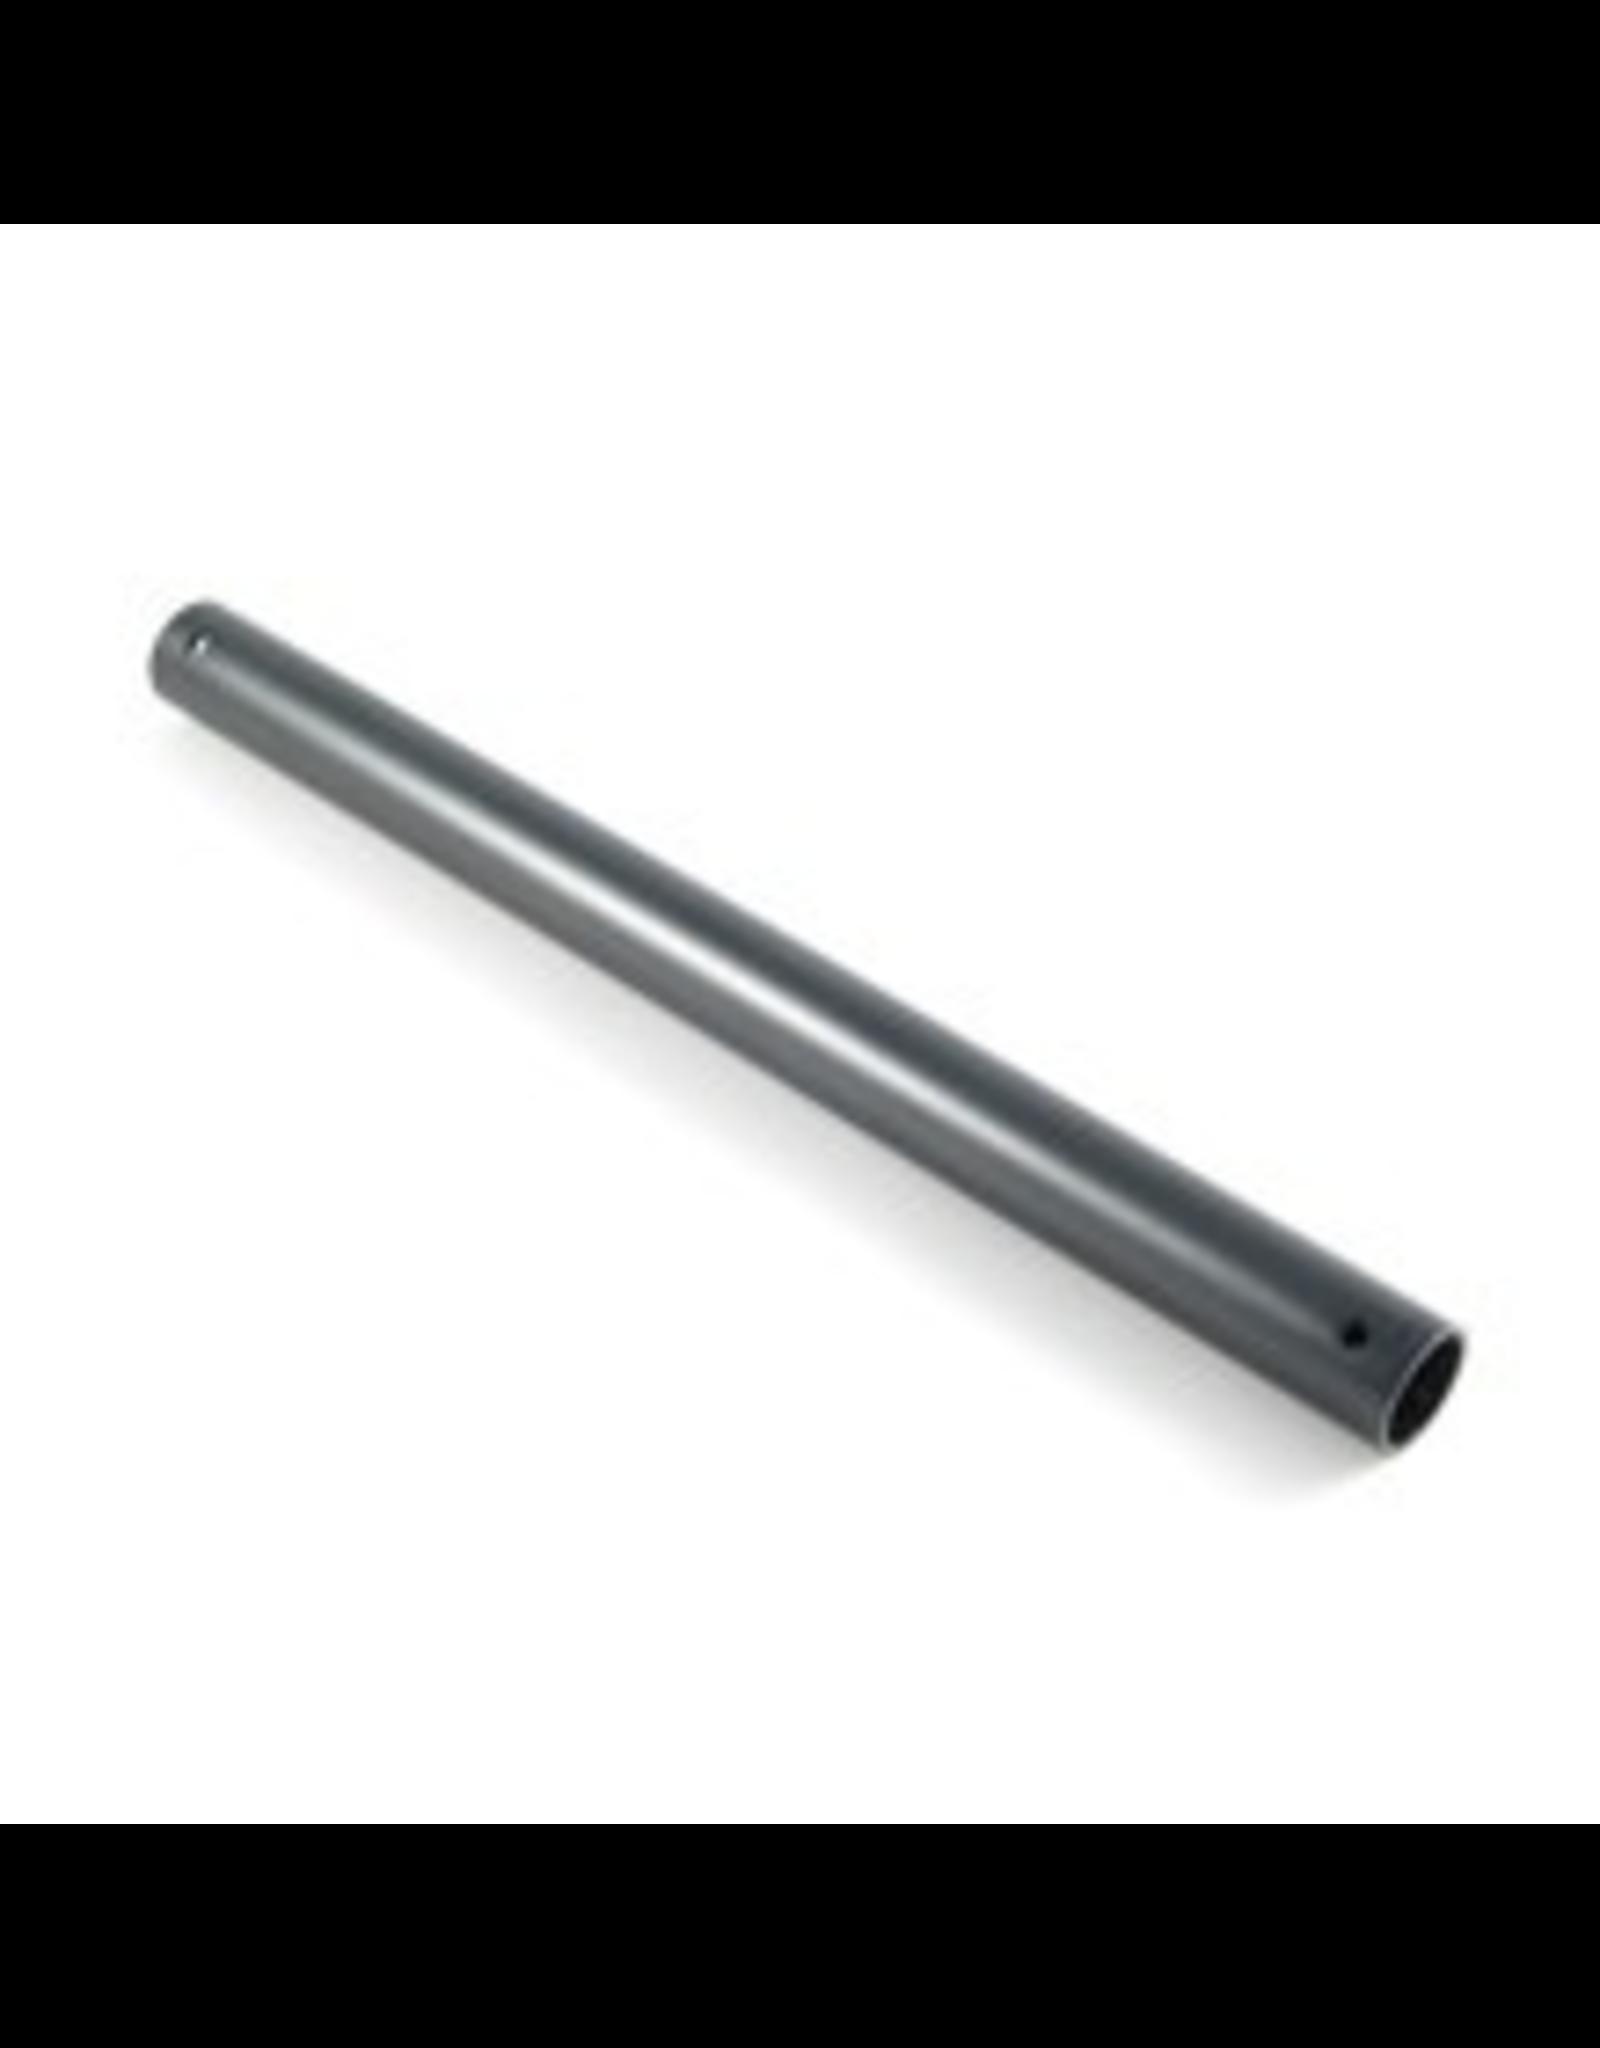 Hobie Hobie Pro Angler H-Bar Strut Tube - Short